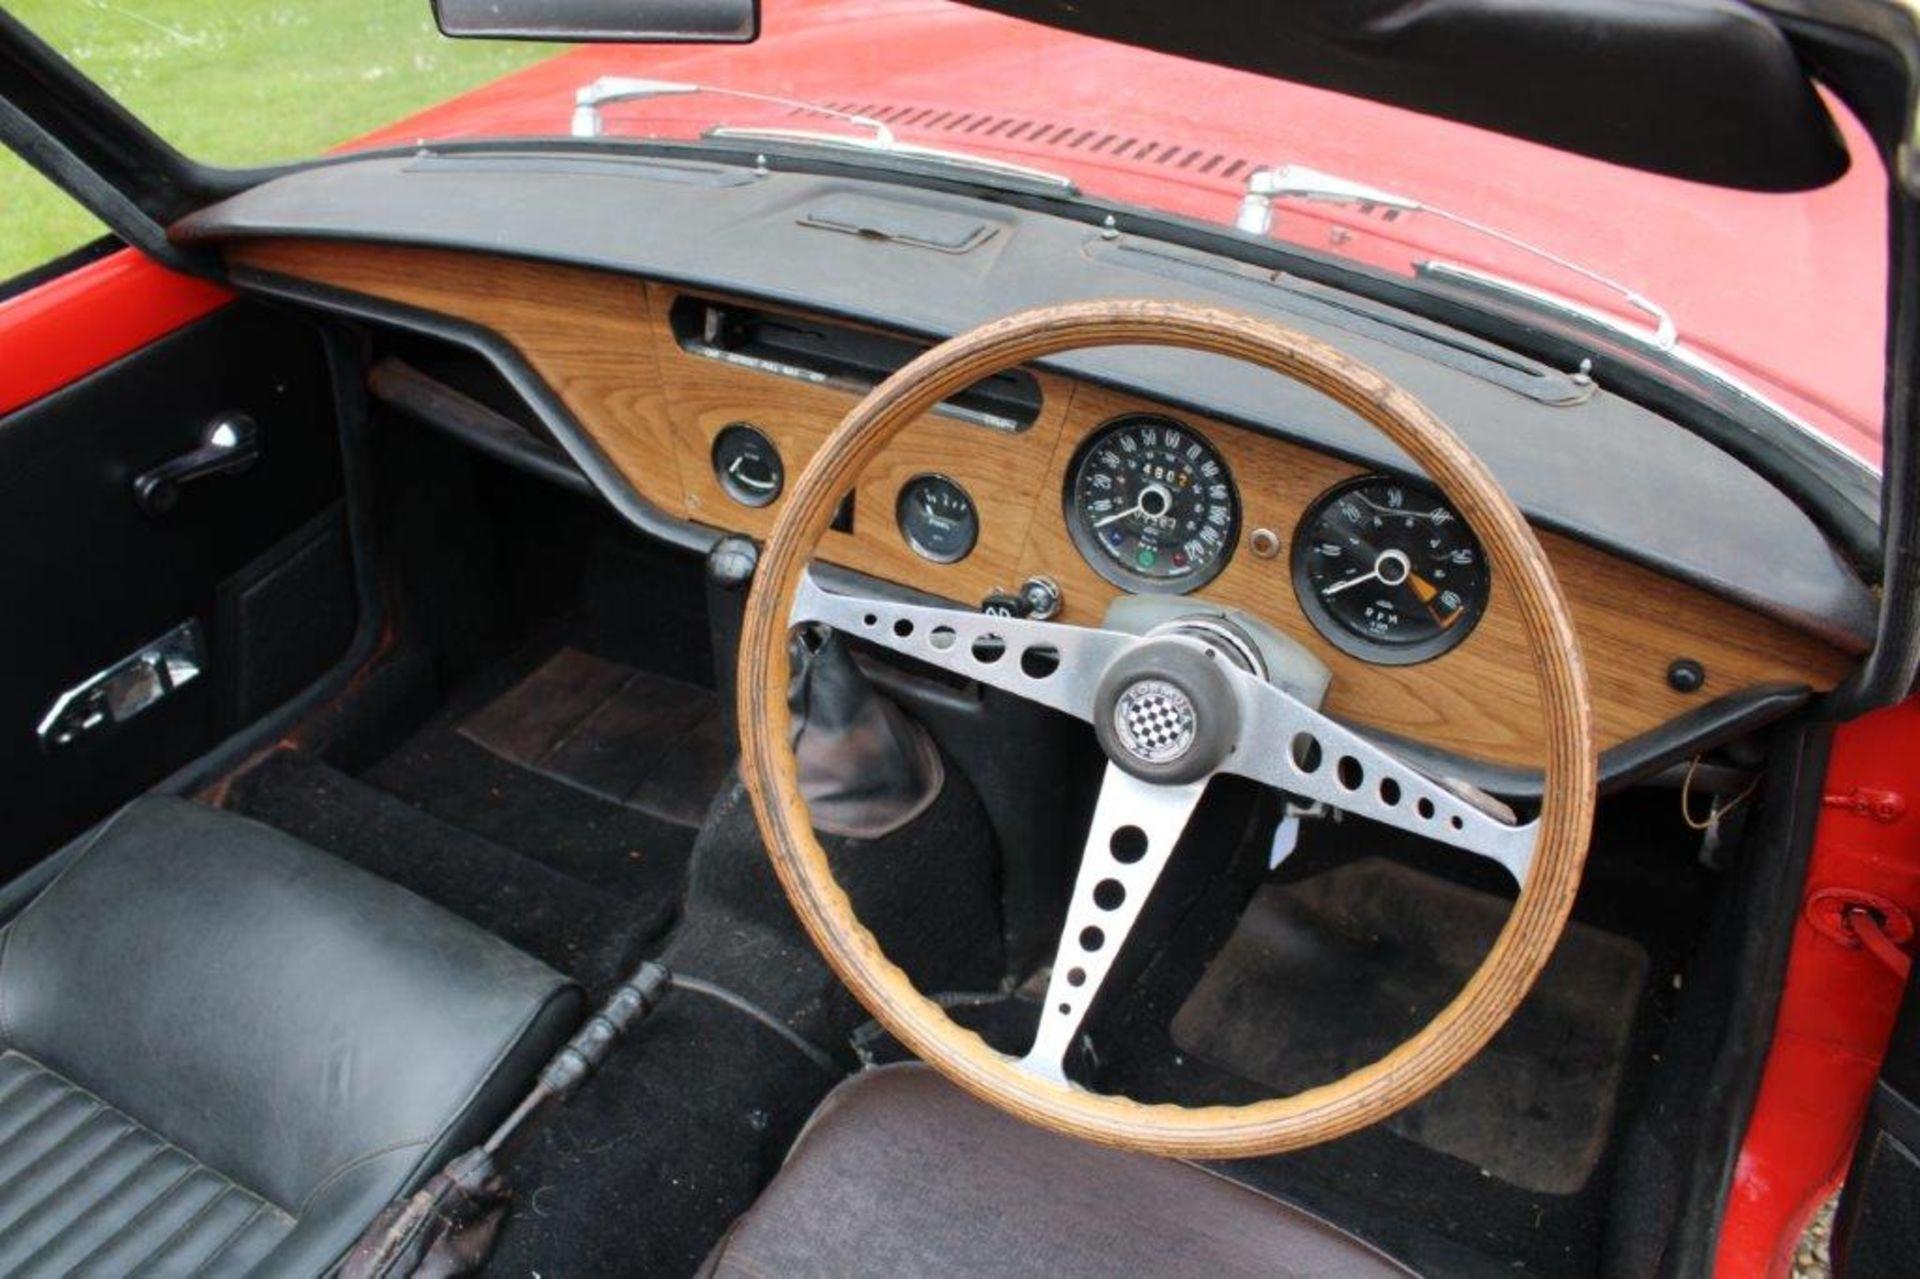 1972 Triumph Spitfire MKIV - Image 18 of 32